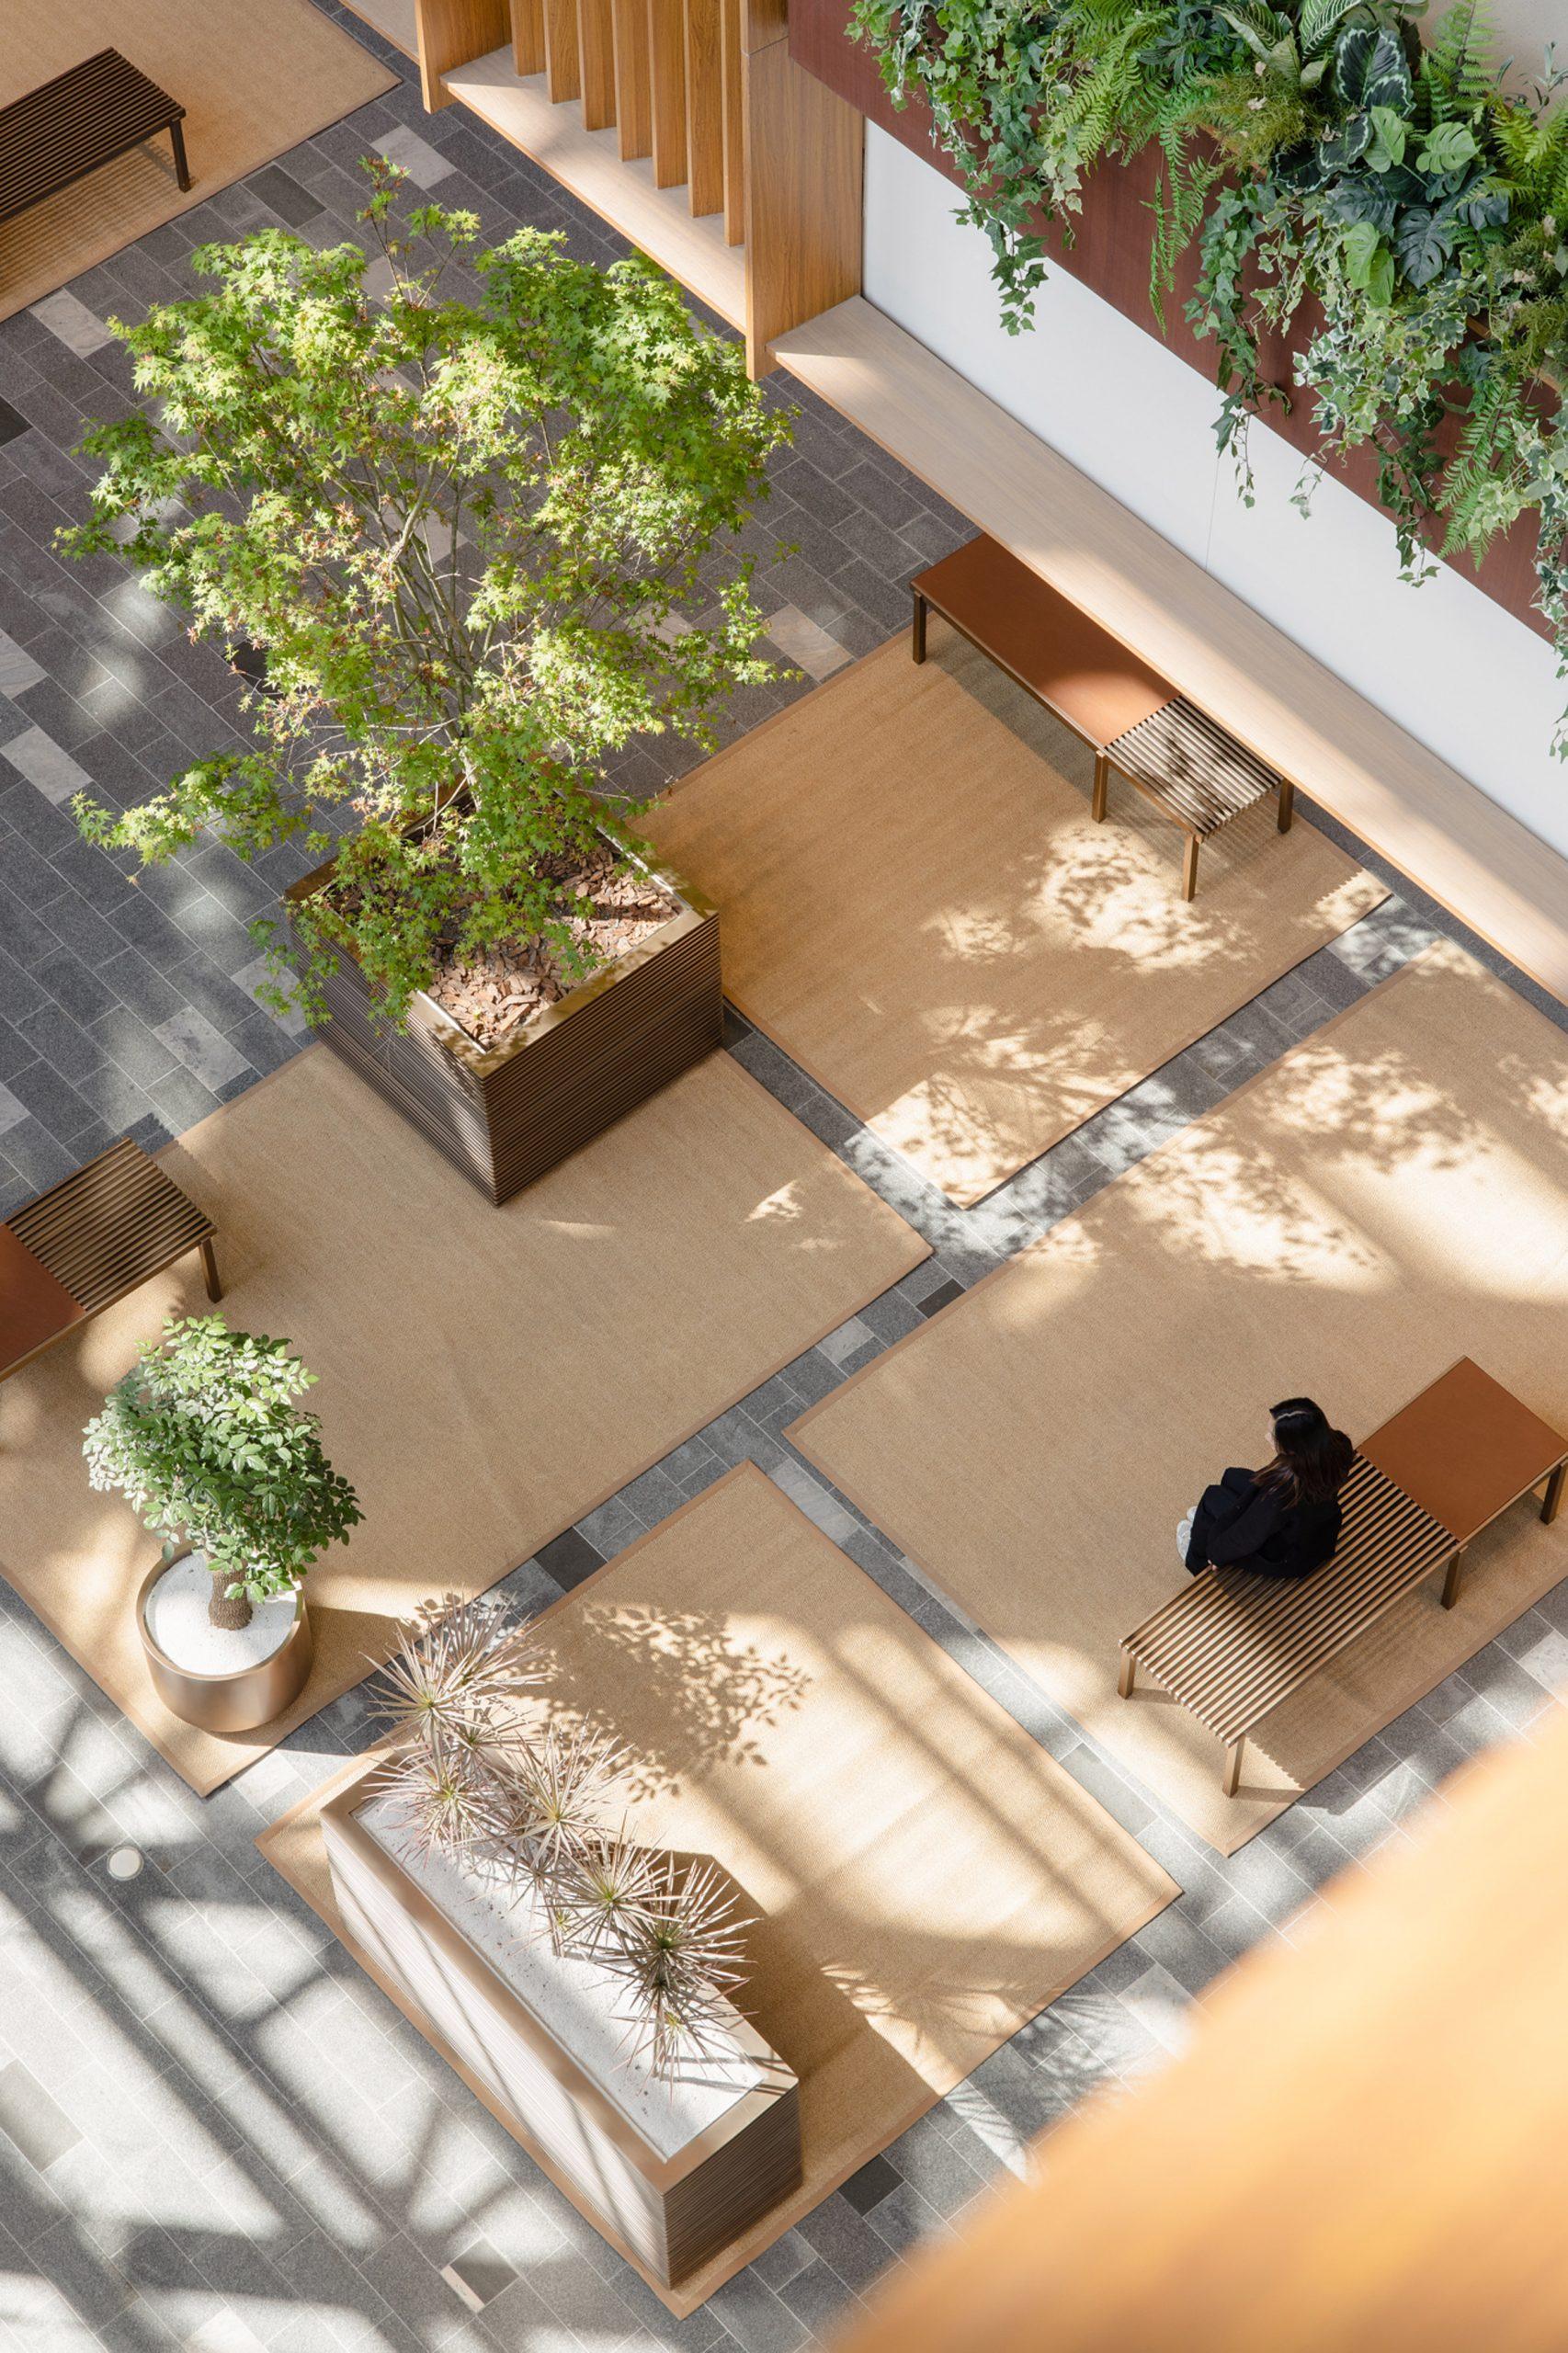 Zones in Xintiandi atrium by AIM Architecture